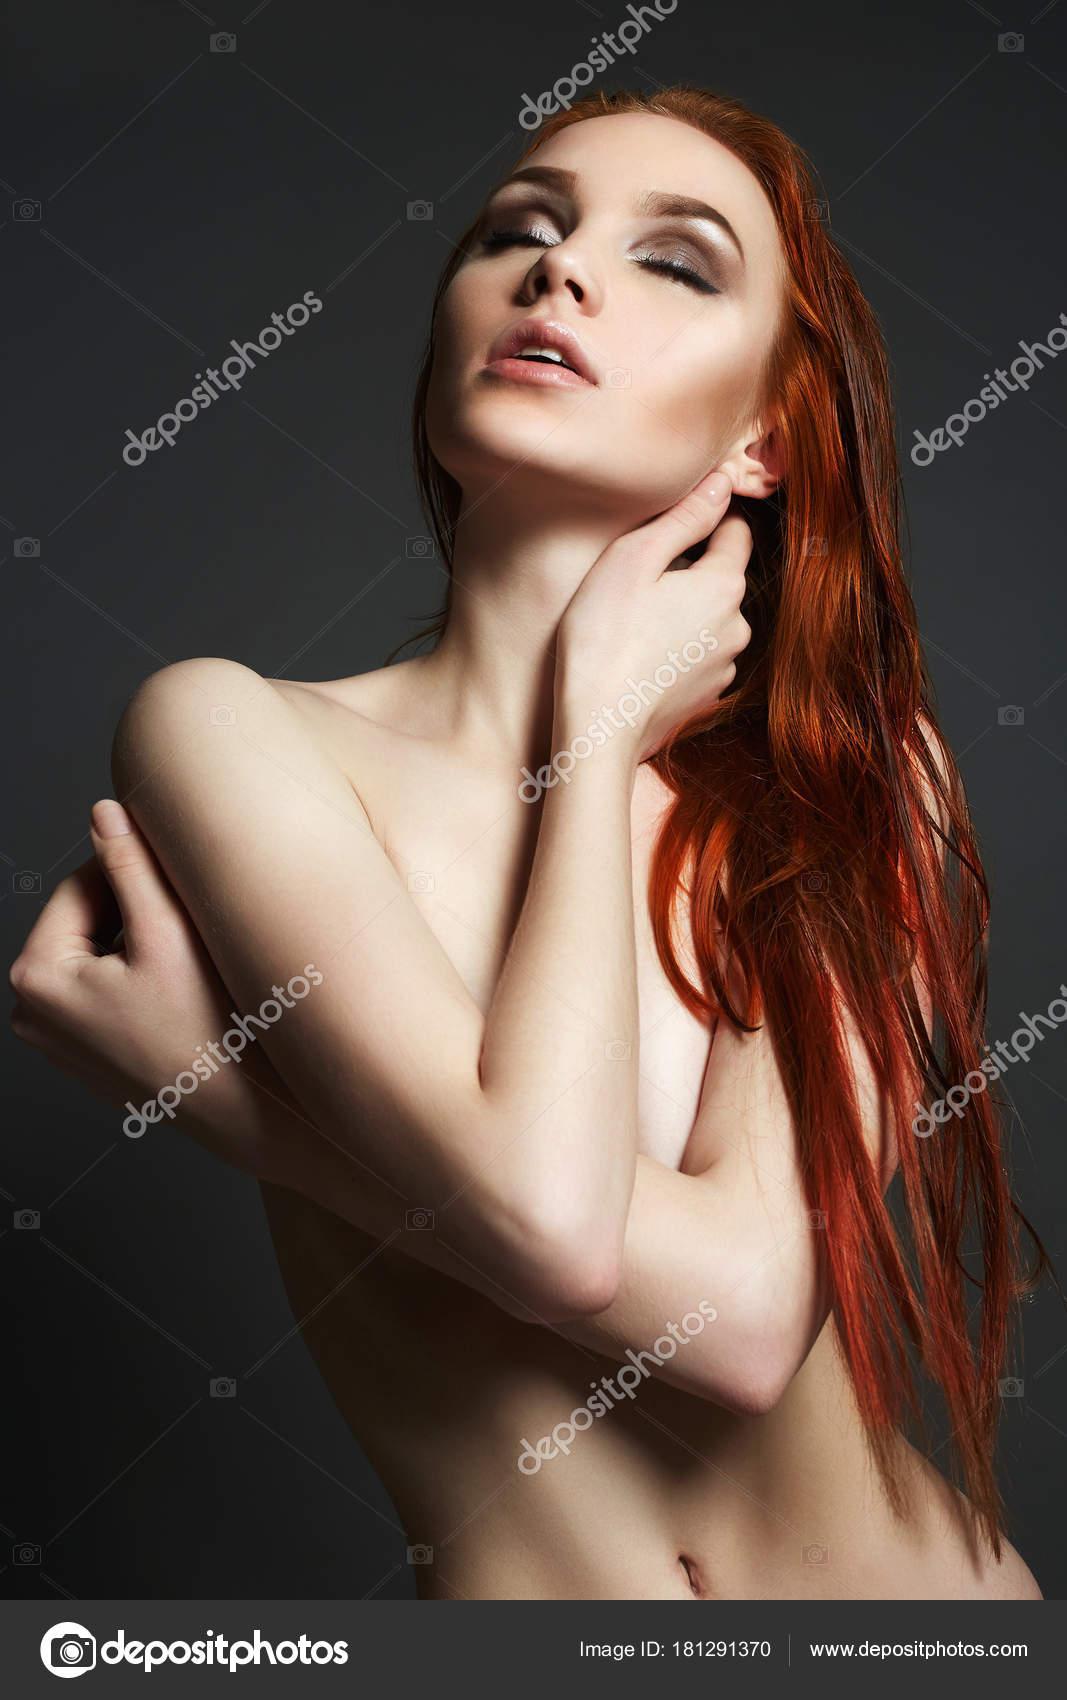 Silvia Αγία πίπα φωτογραφίες